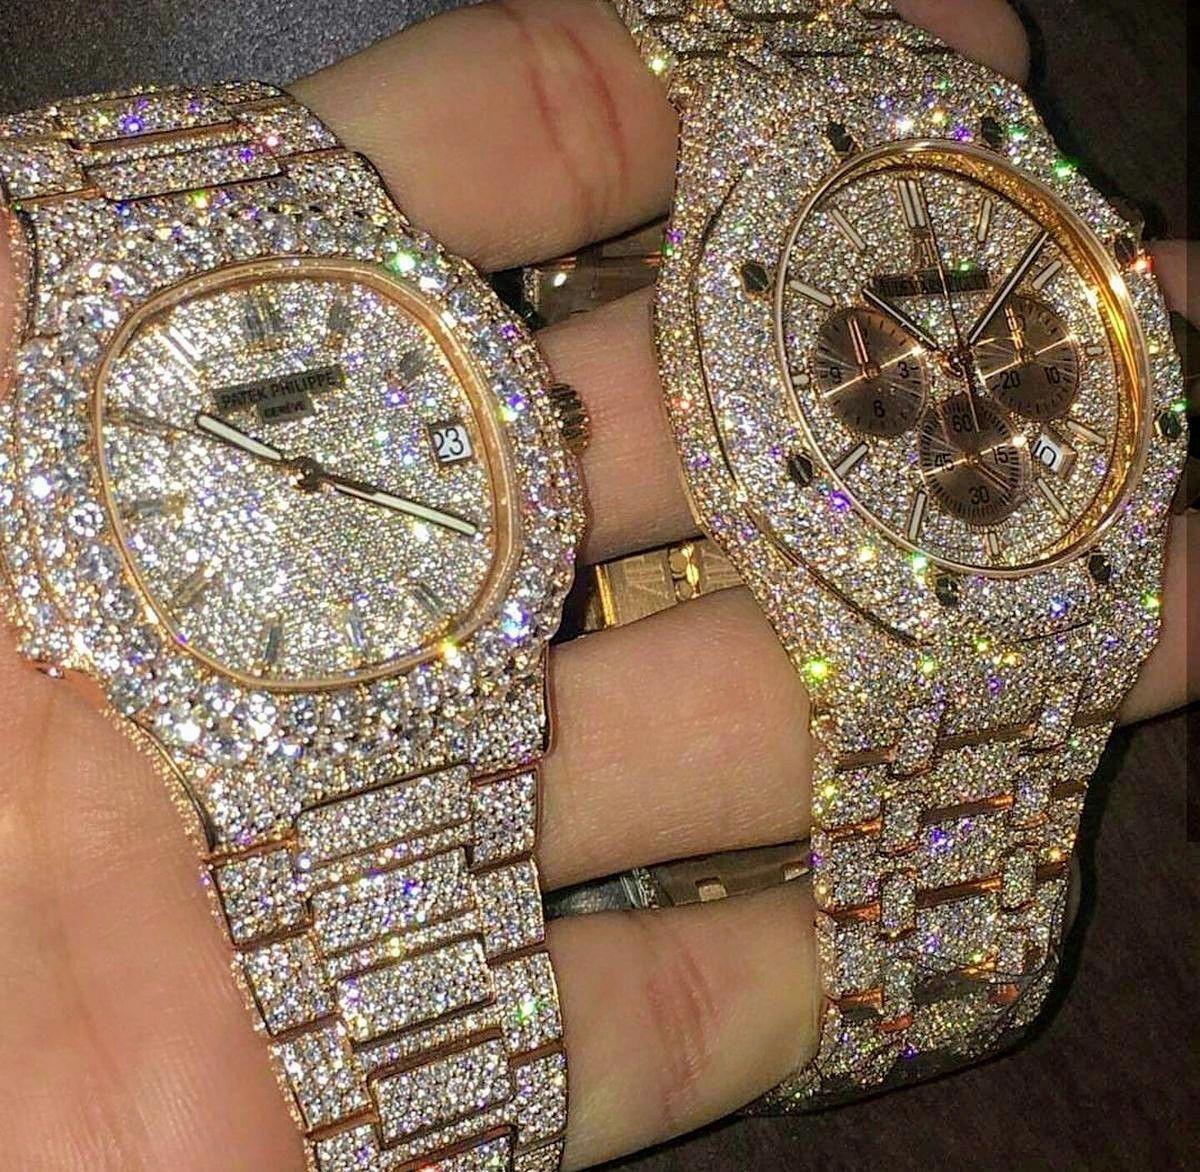 Swiss Army Watches Are So Precise En 2020 Joyeria De Lujo Joyas De Diamantes Relojes Elegantes